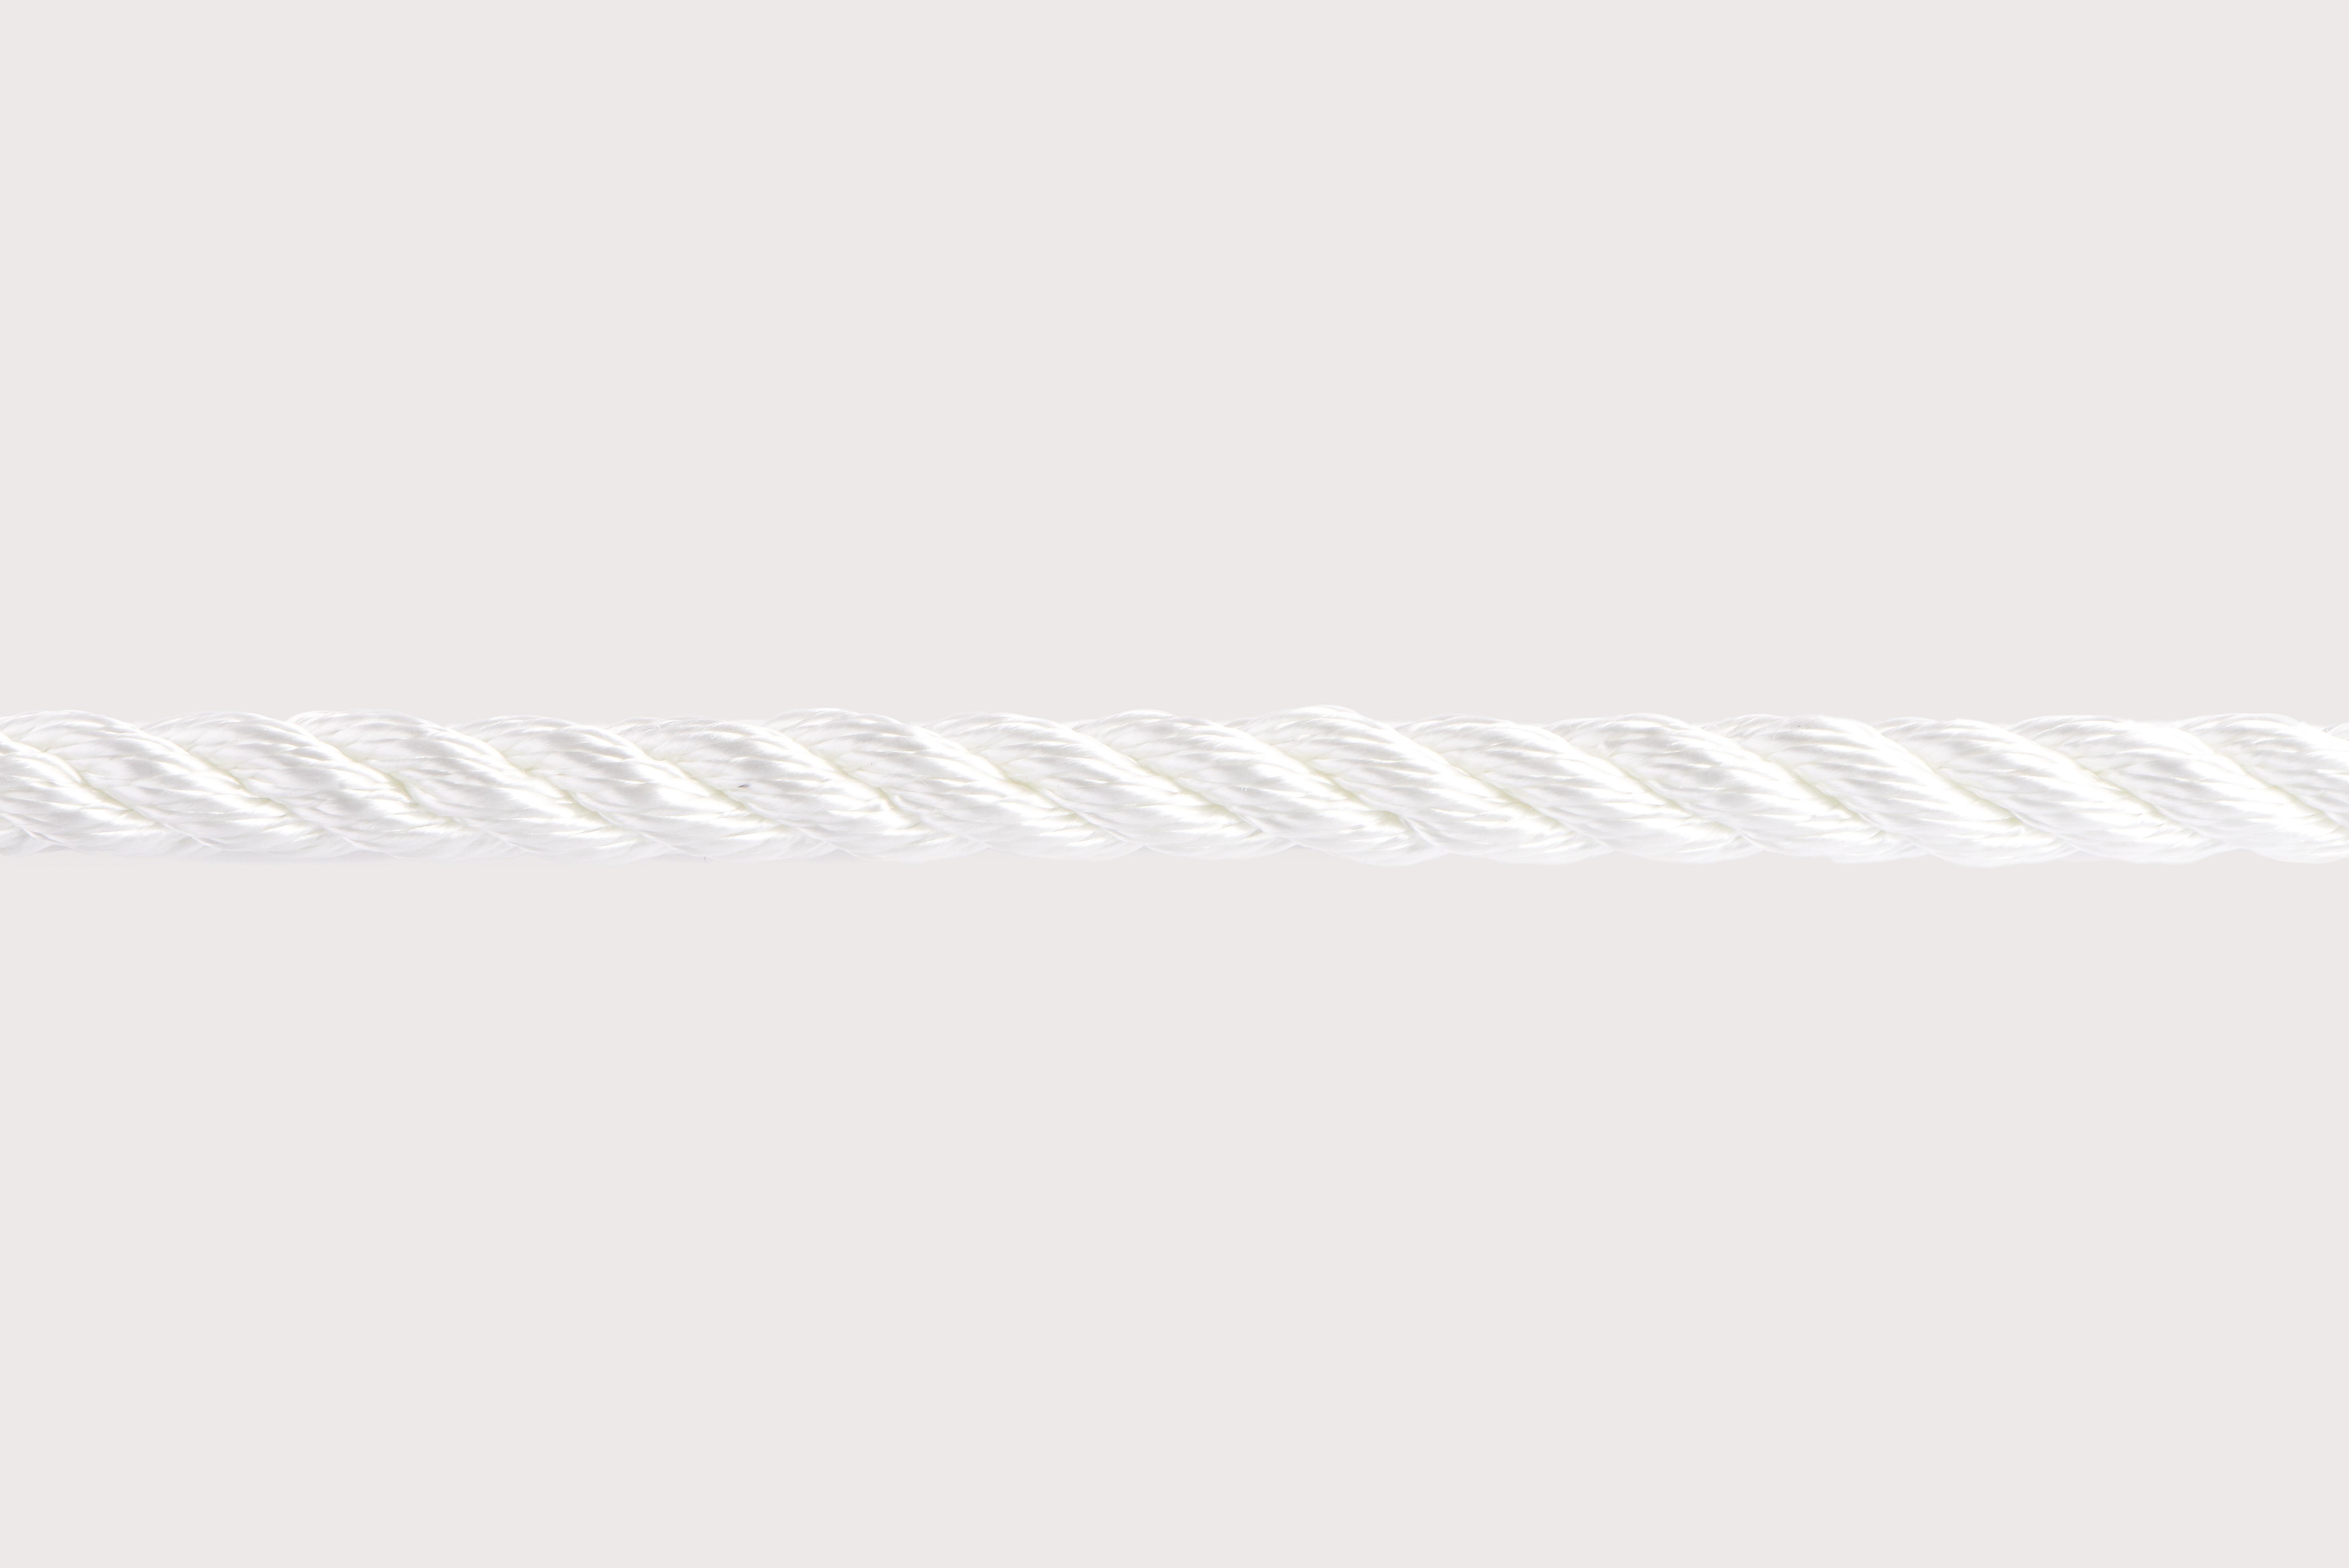 Orion-Cordage-Industrial 3-Strand Nylon-White-Horizontal65.jpg